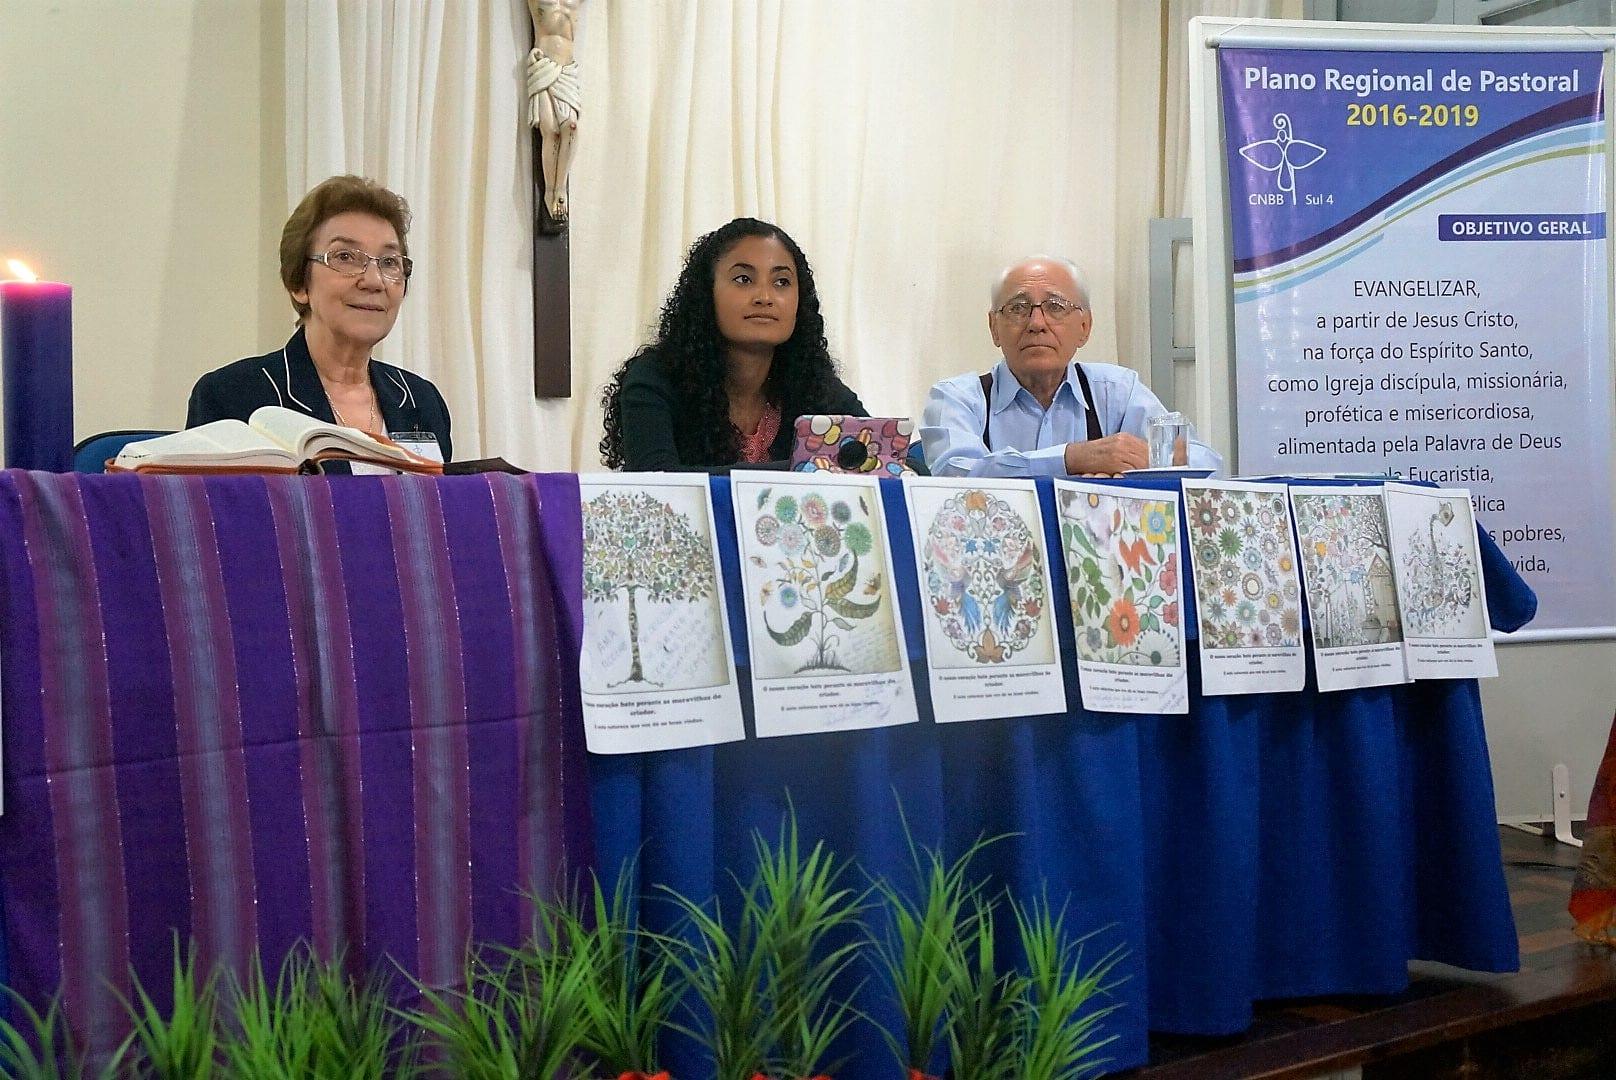 Irmã Rosita Milesi (esquerda) afirmou que apoio aos imigrantes é imperativo humanitário (Foto: Marcelo Luiz Zapelini/CNBB Sul 4)